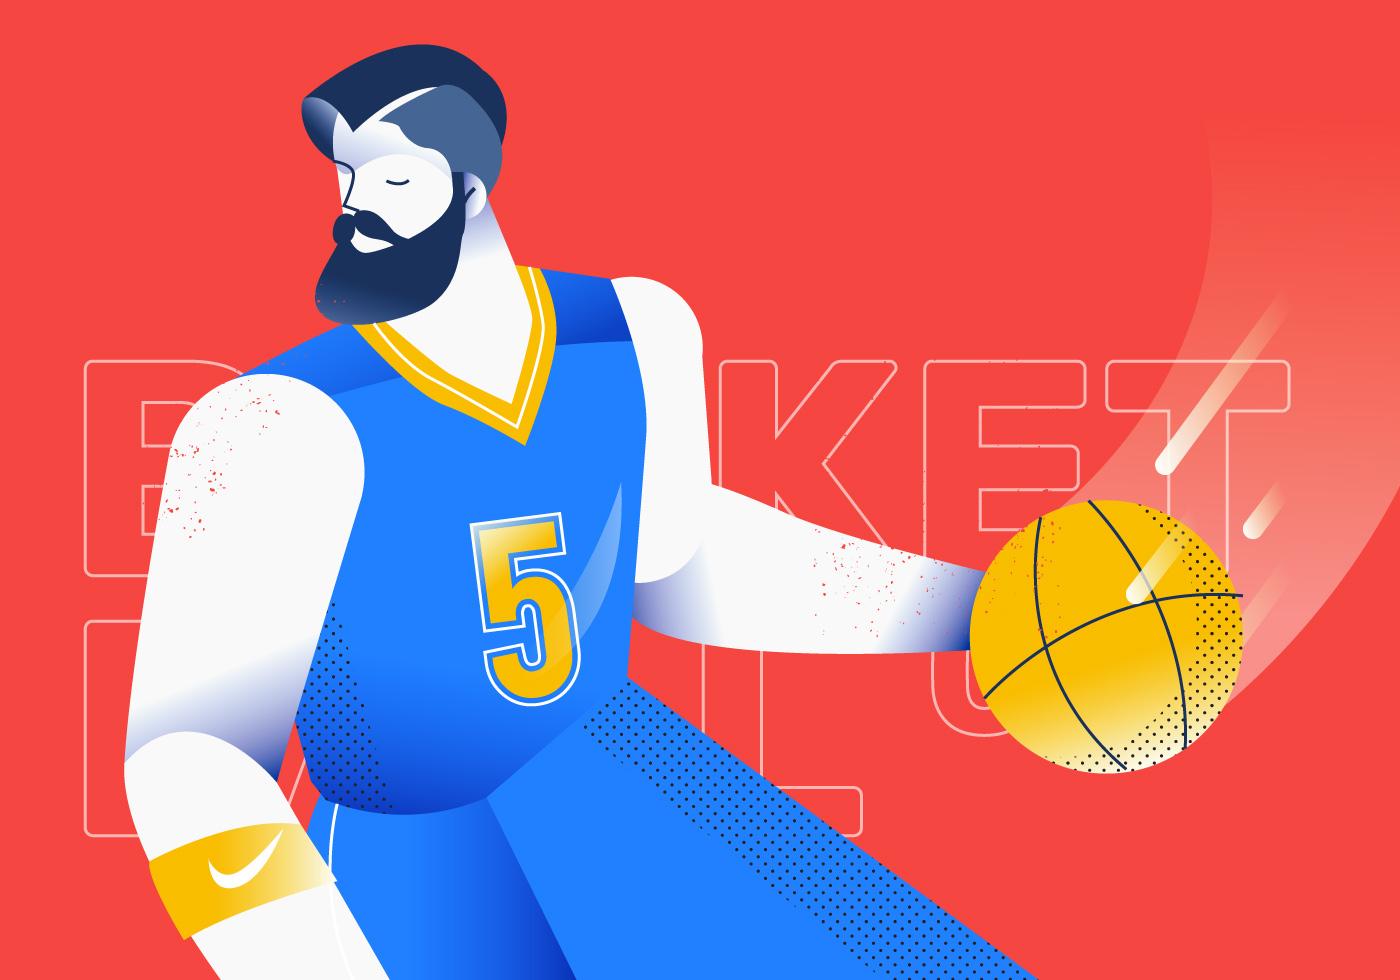 Basketball illustration joueur Moc 1